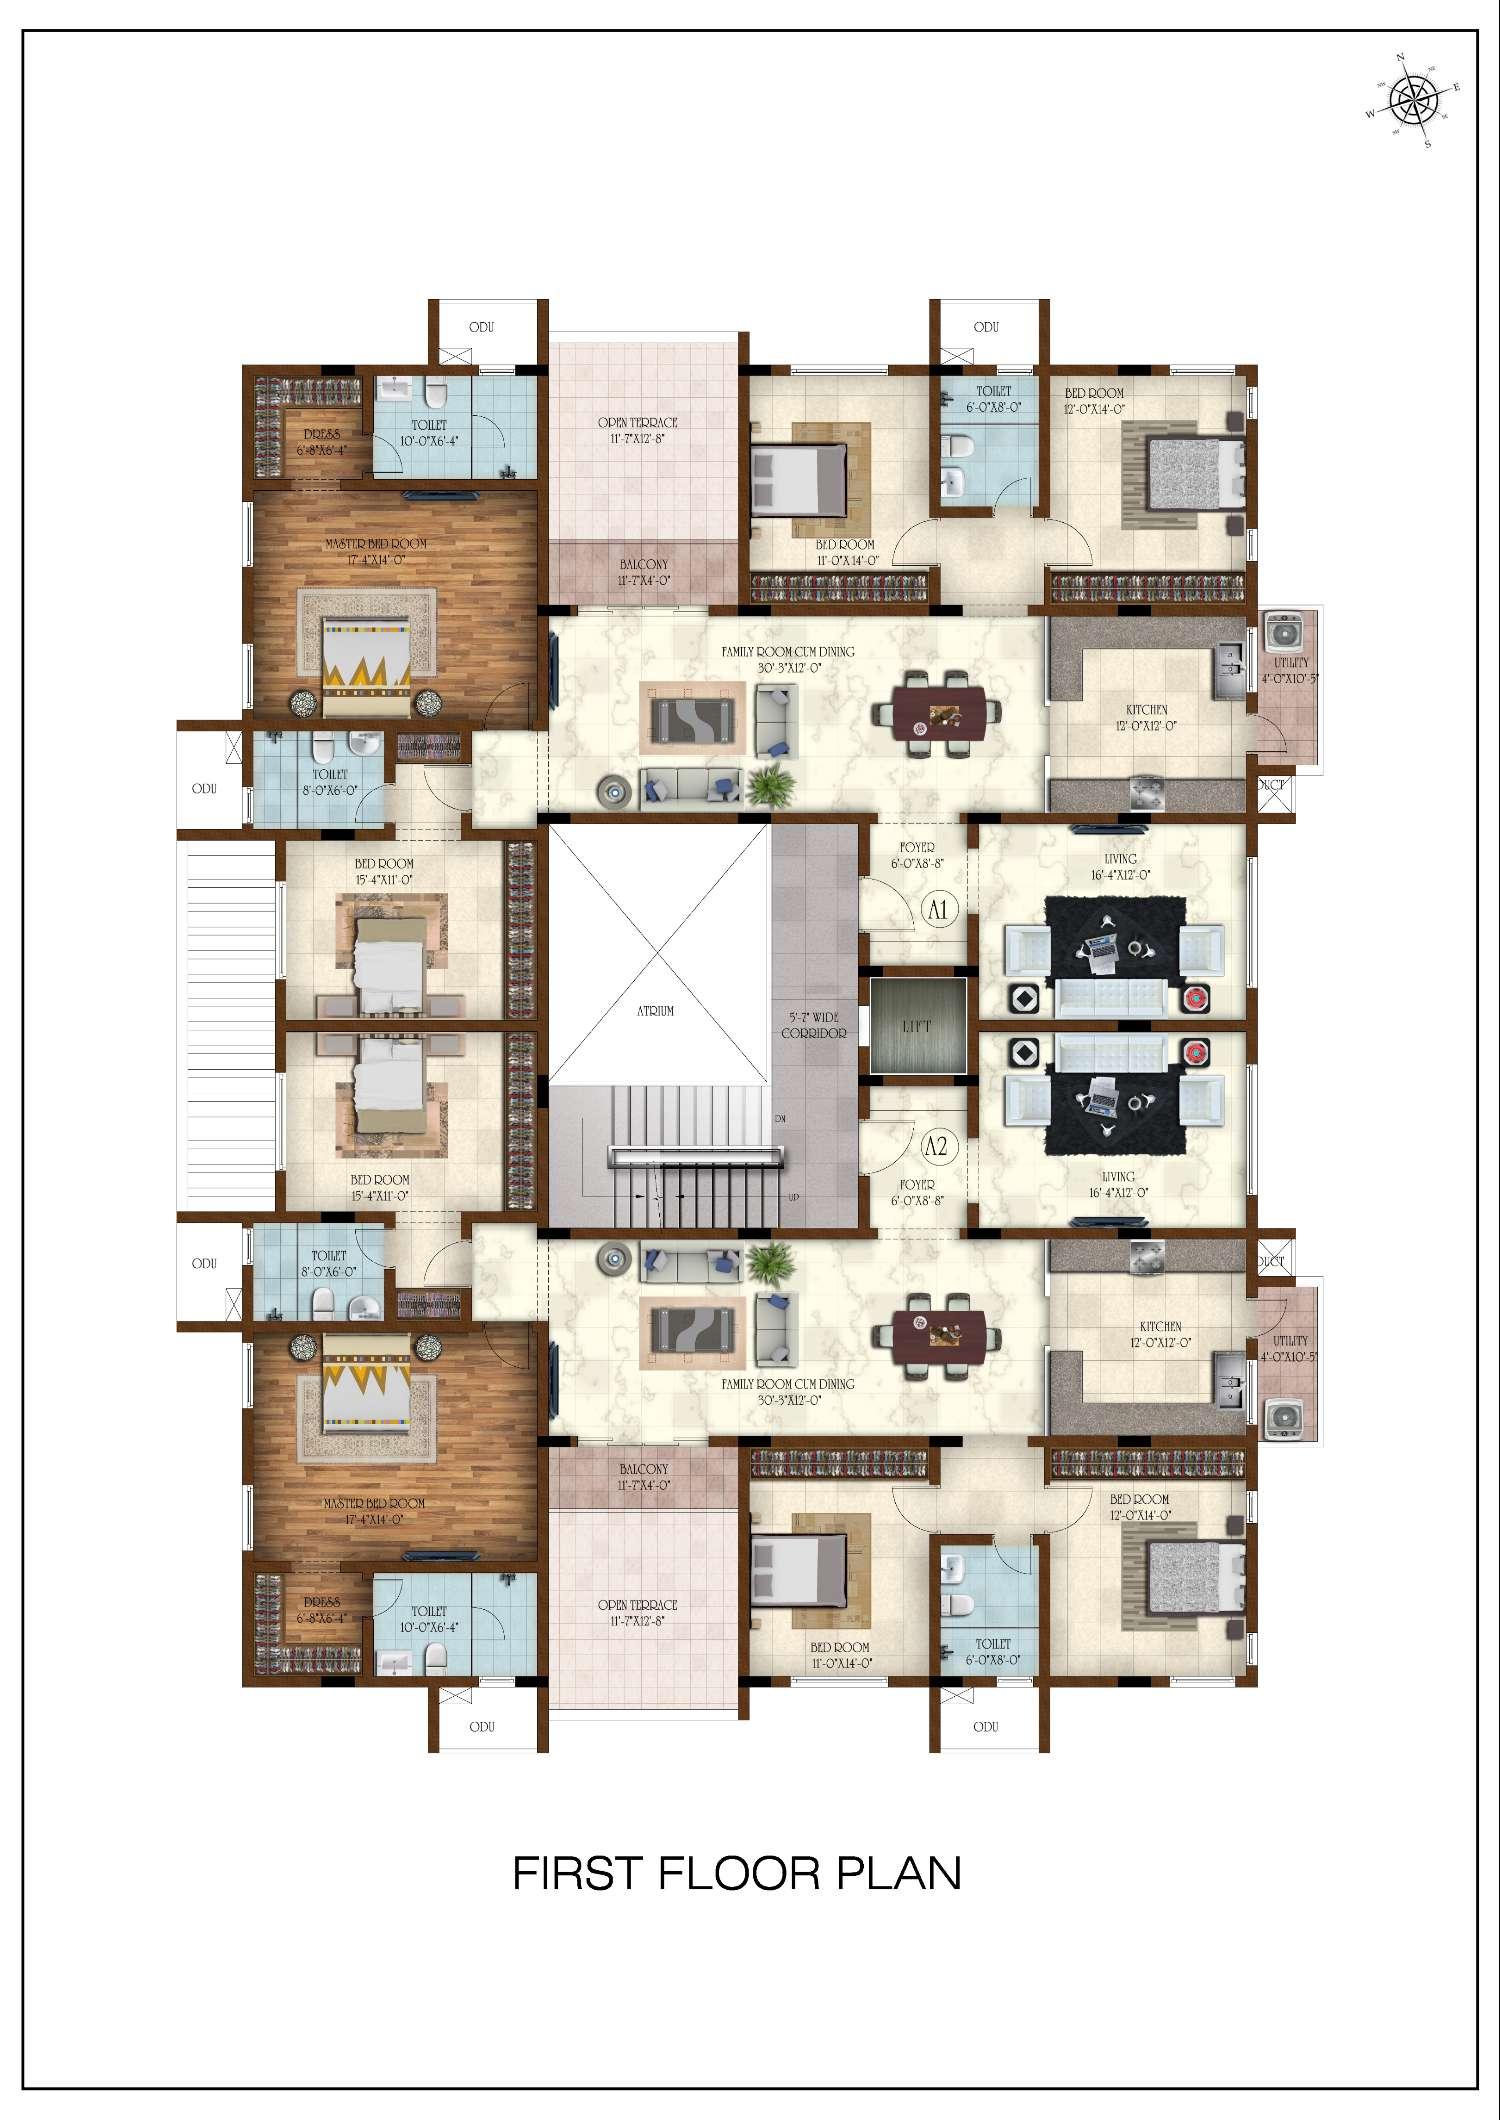 Casa Grande Joybijoy,Gopalapuram